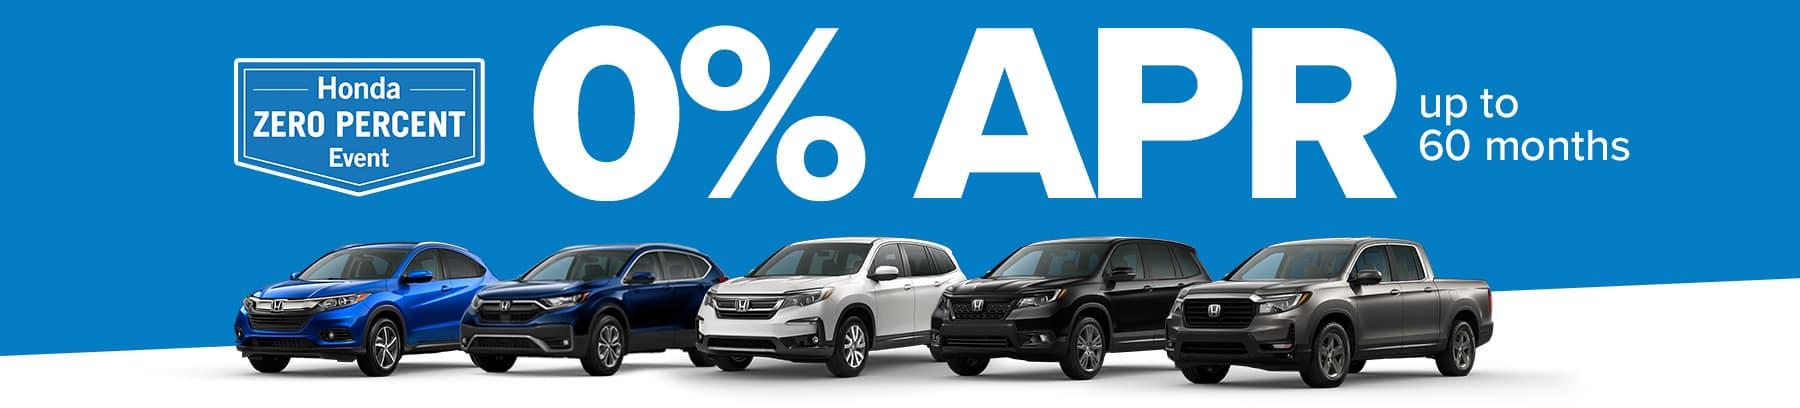 Honda Zero Percent Event - 0% APR up to 60 months